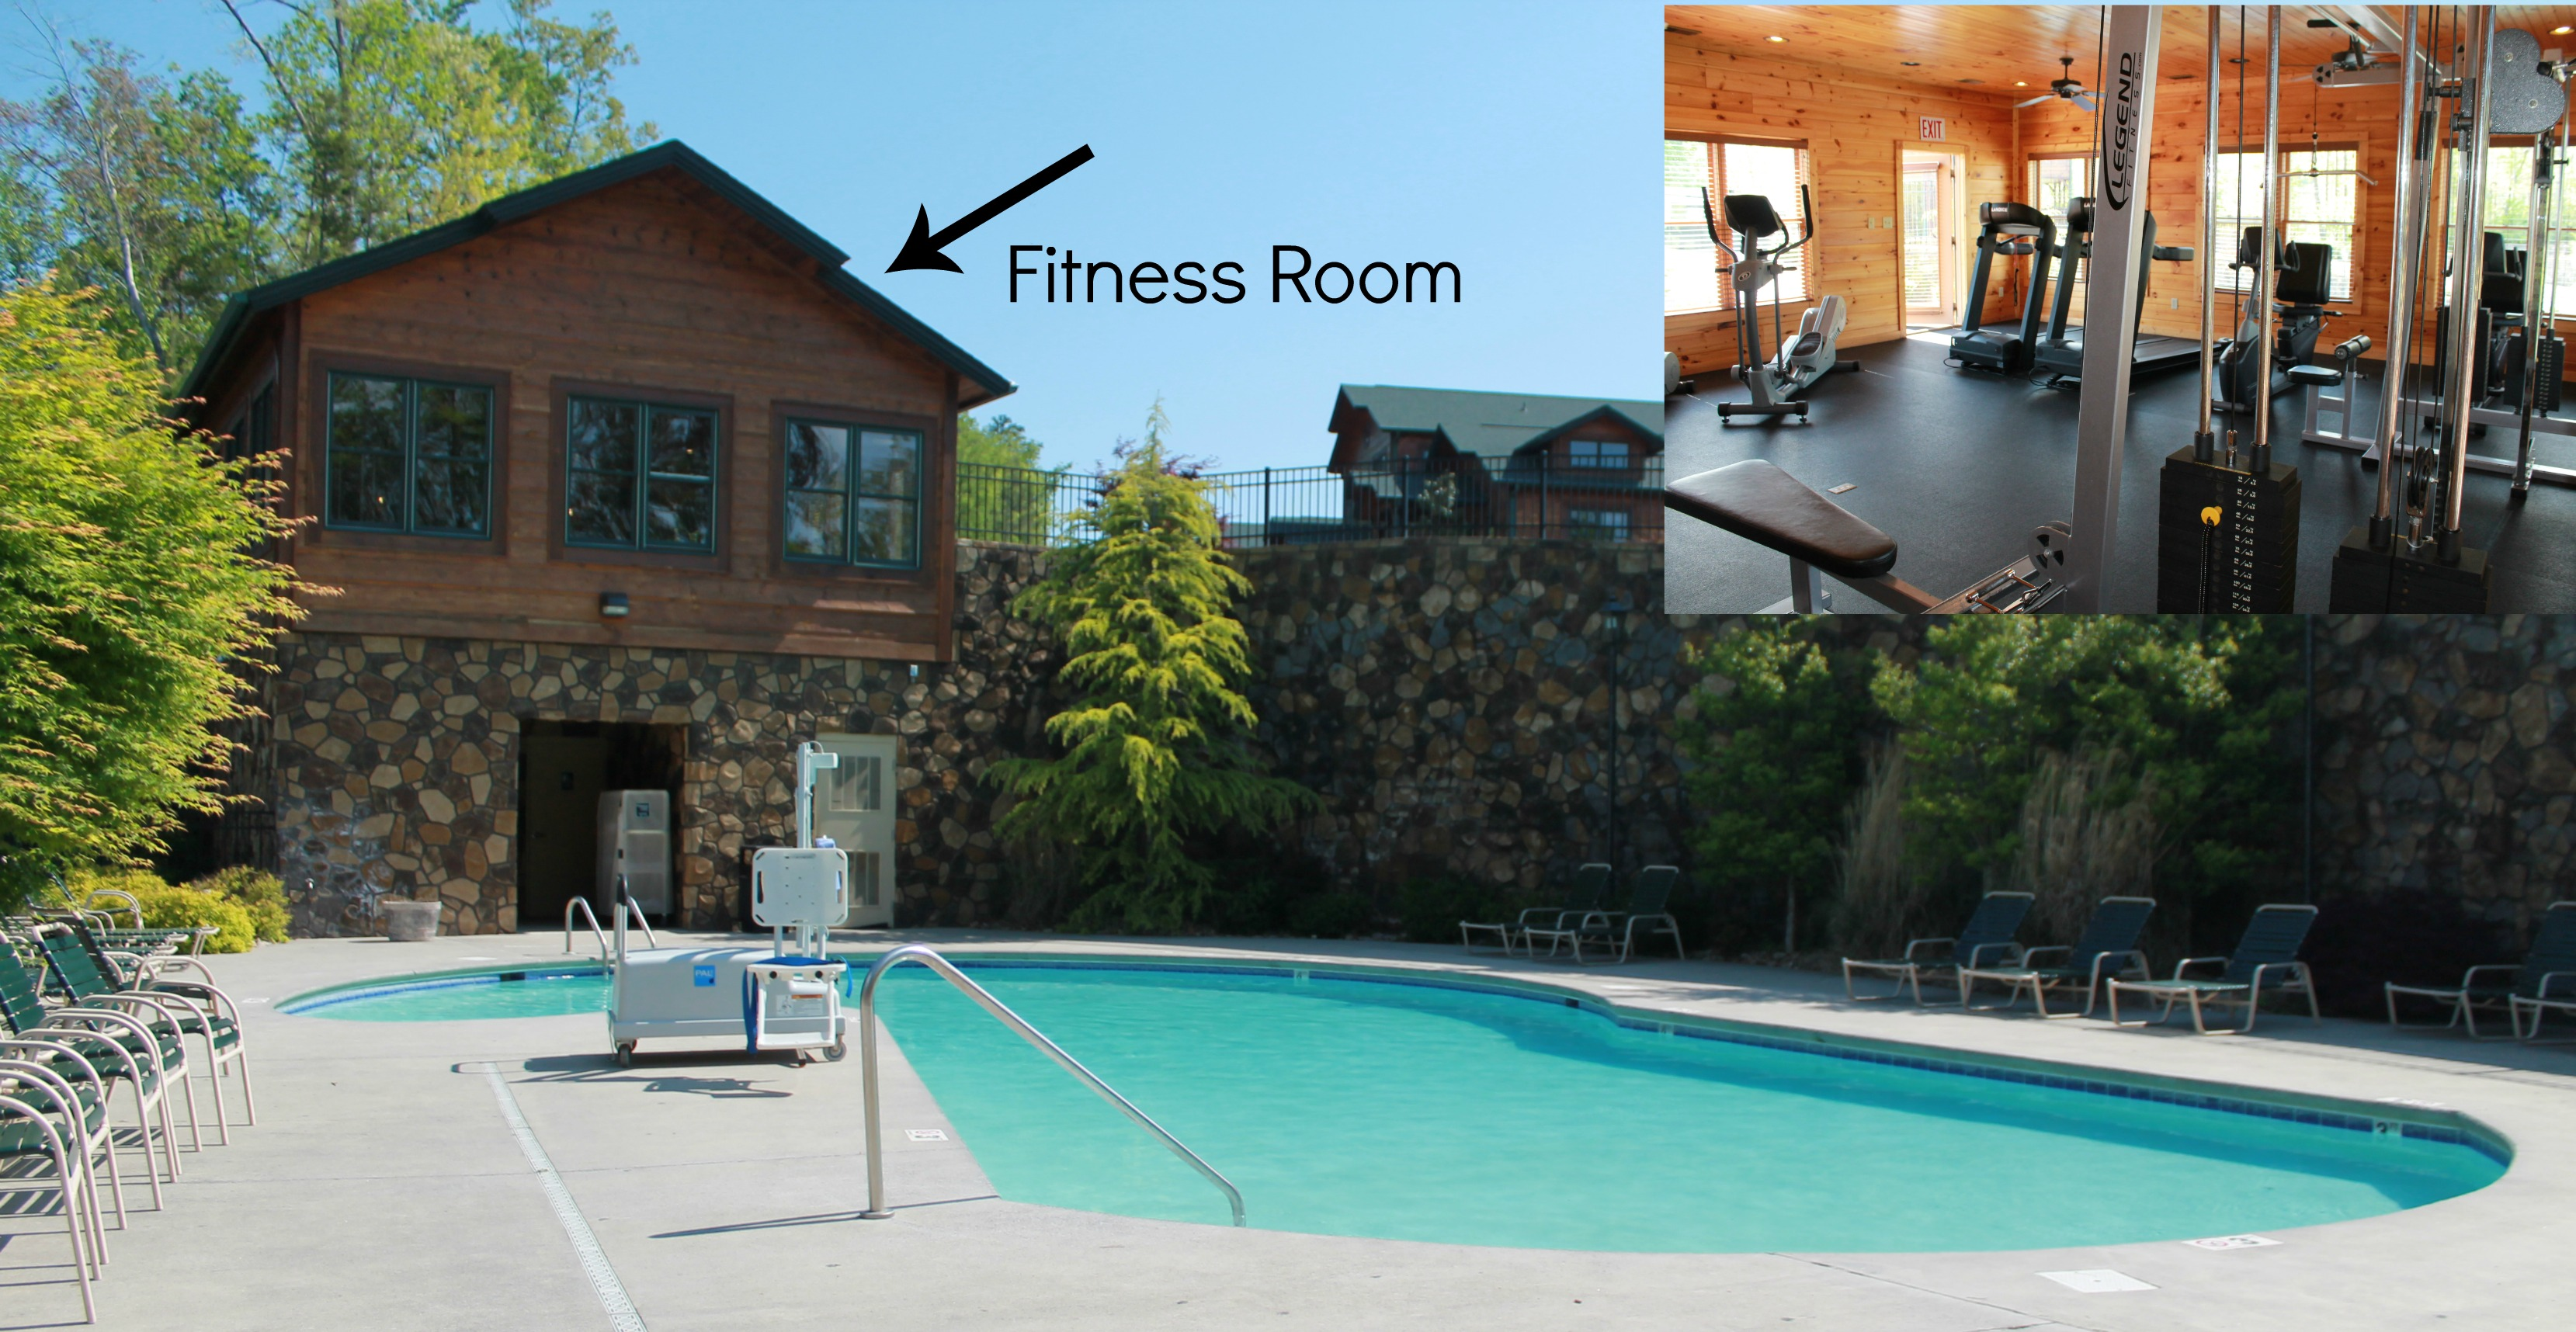 A cabin with style gatlinburg falls resort simply - Gatlinburg falls resort swimming pool ...